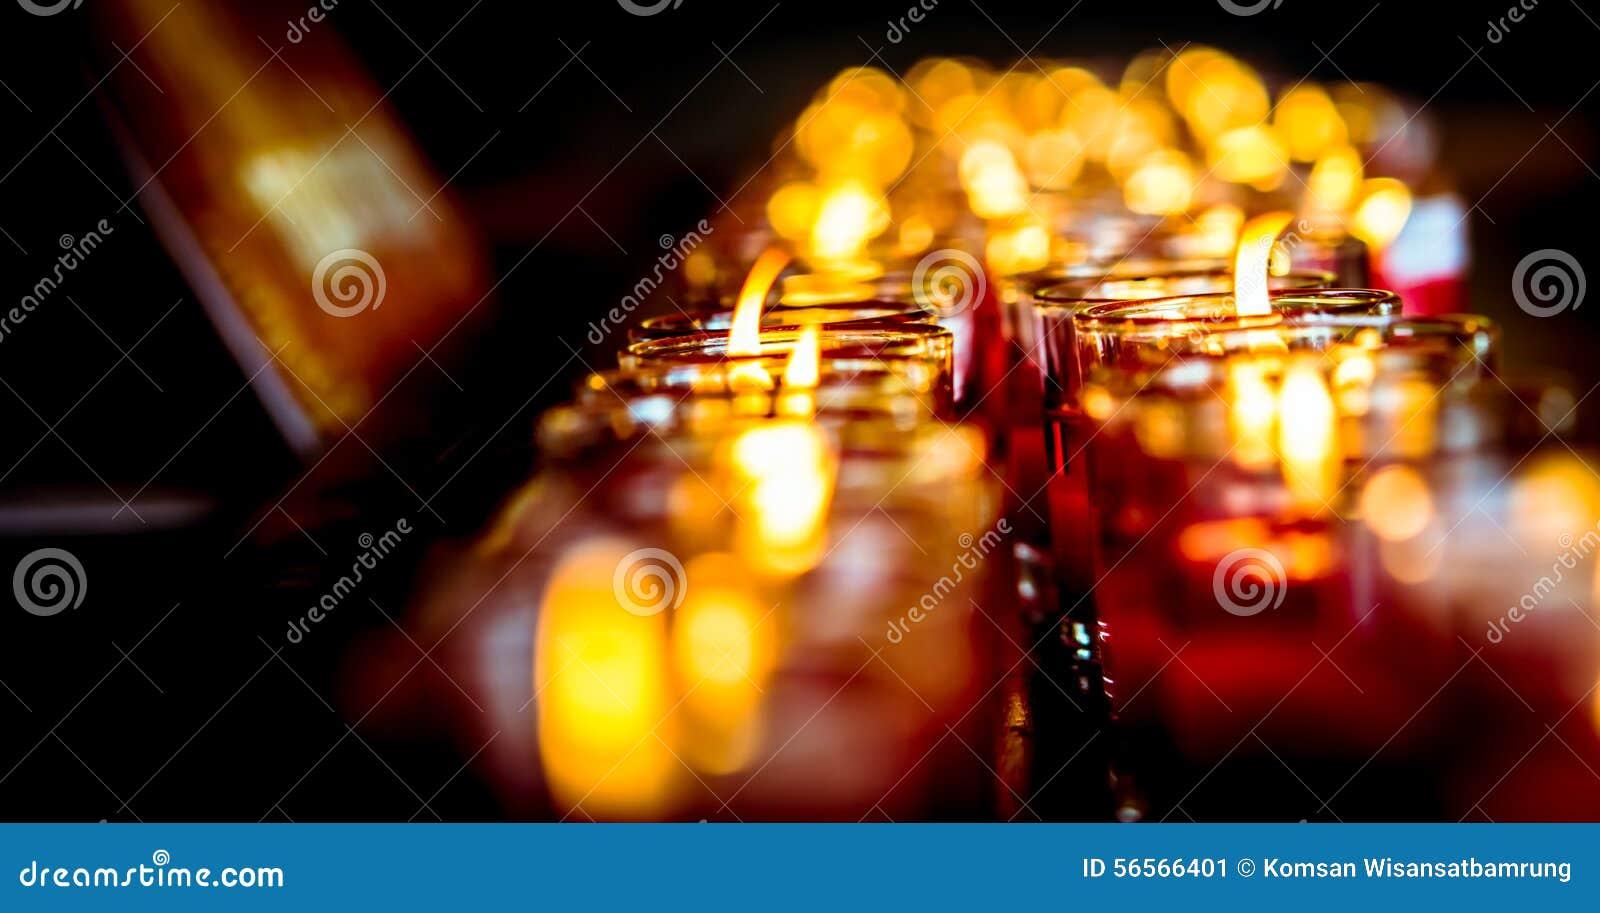 Download Φως και Bokeh υπόβαθρο κεριών Στοκ Εικόνα - εικόνα από ρωμανικός, candlelight: 56566401